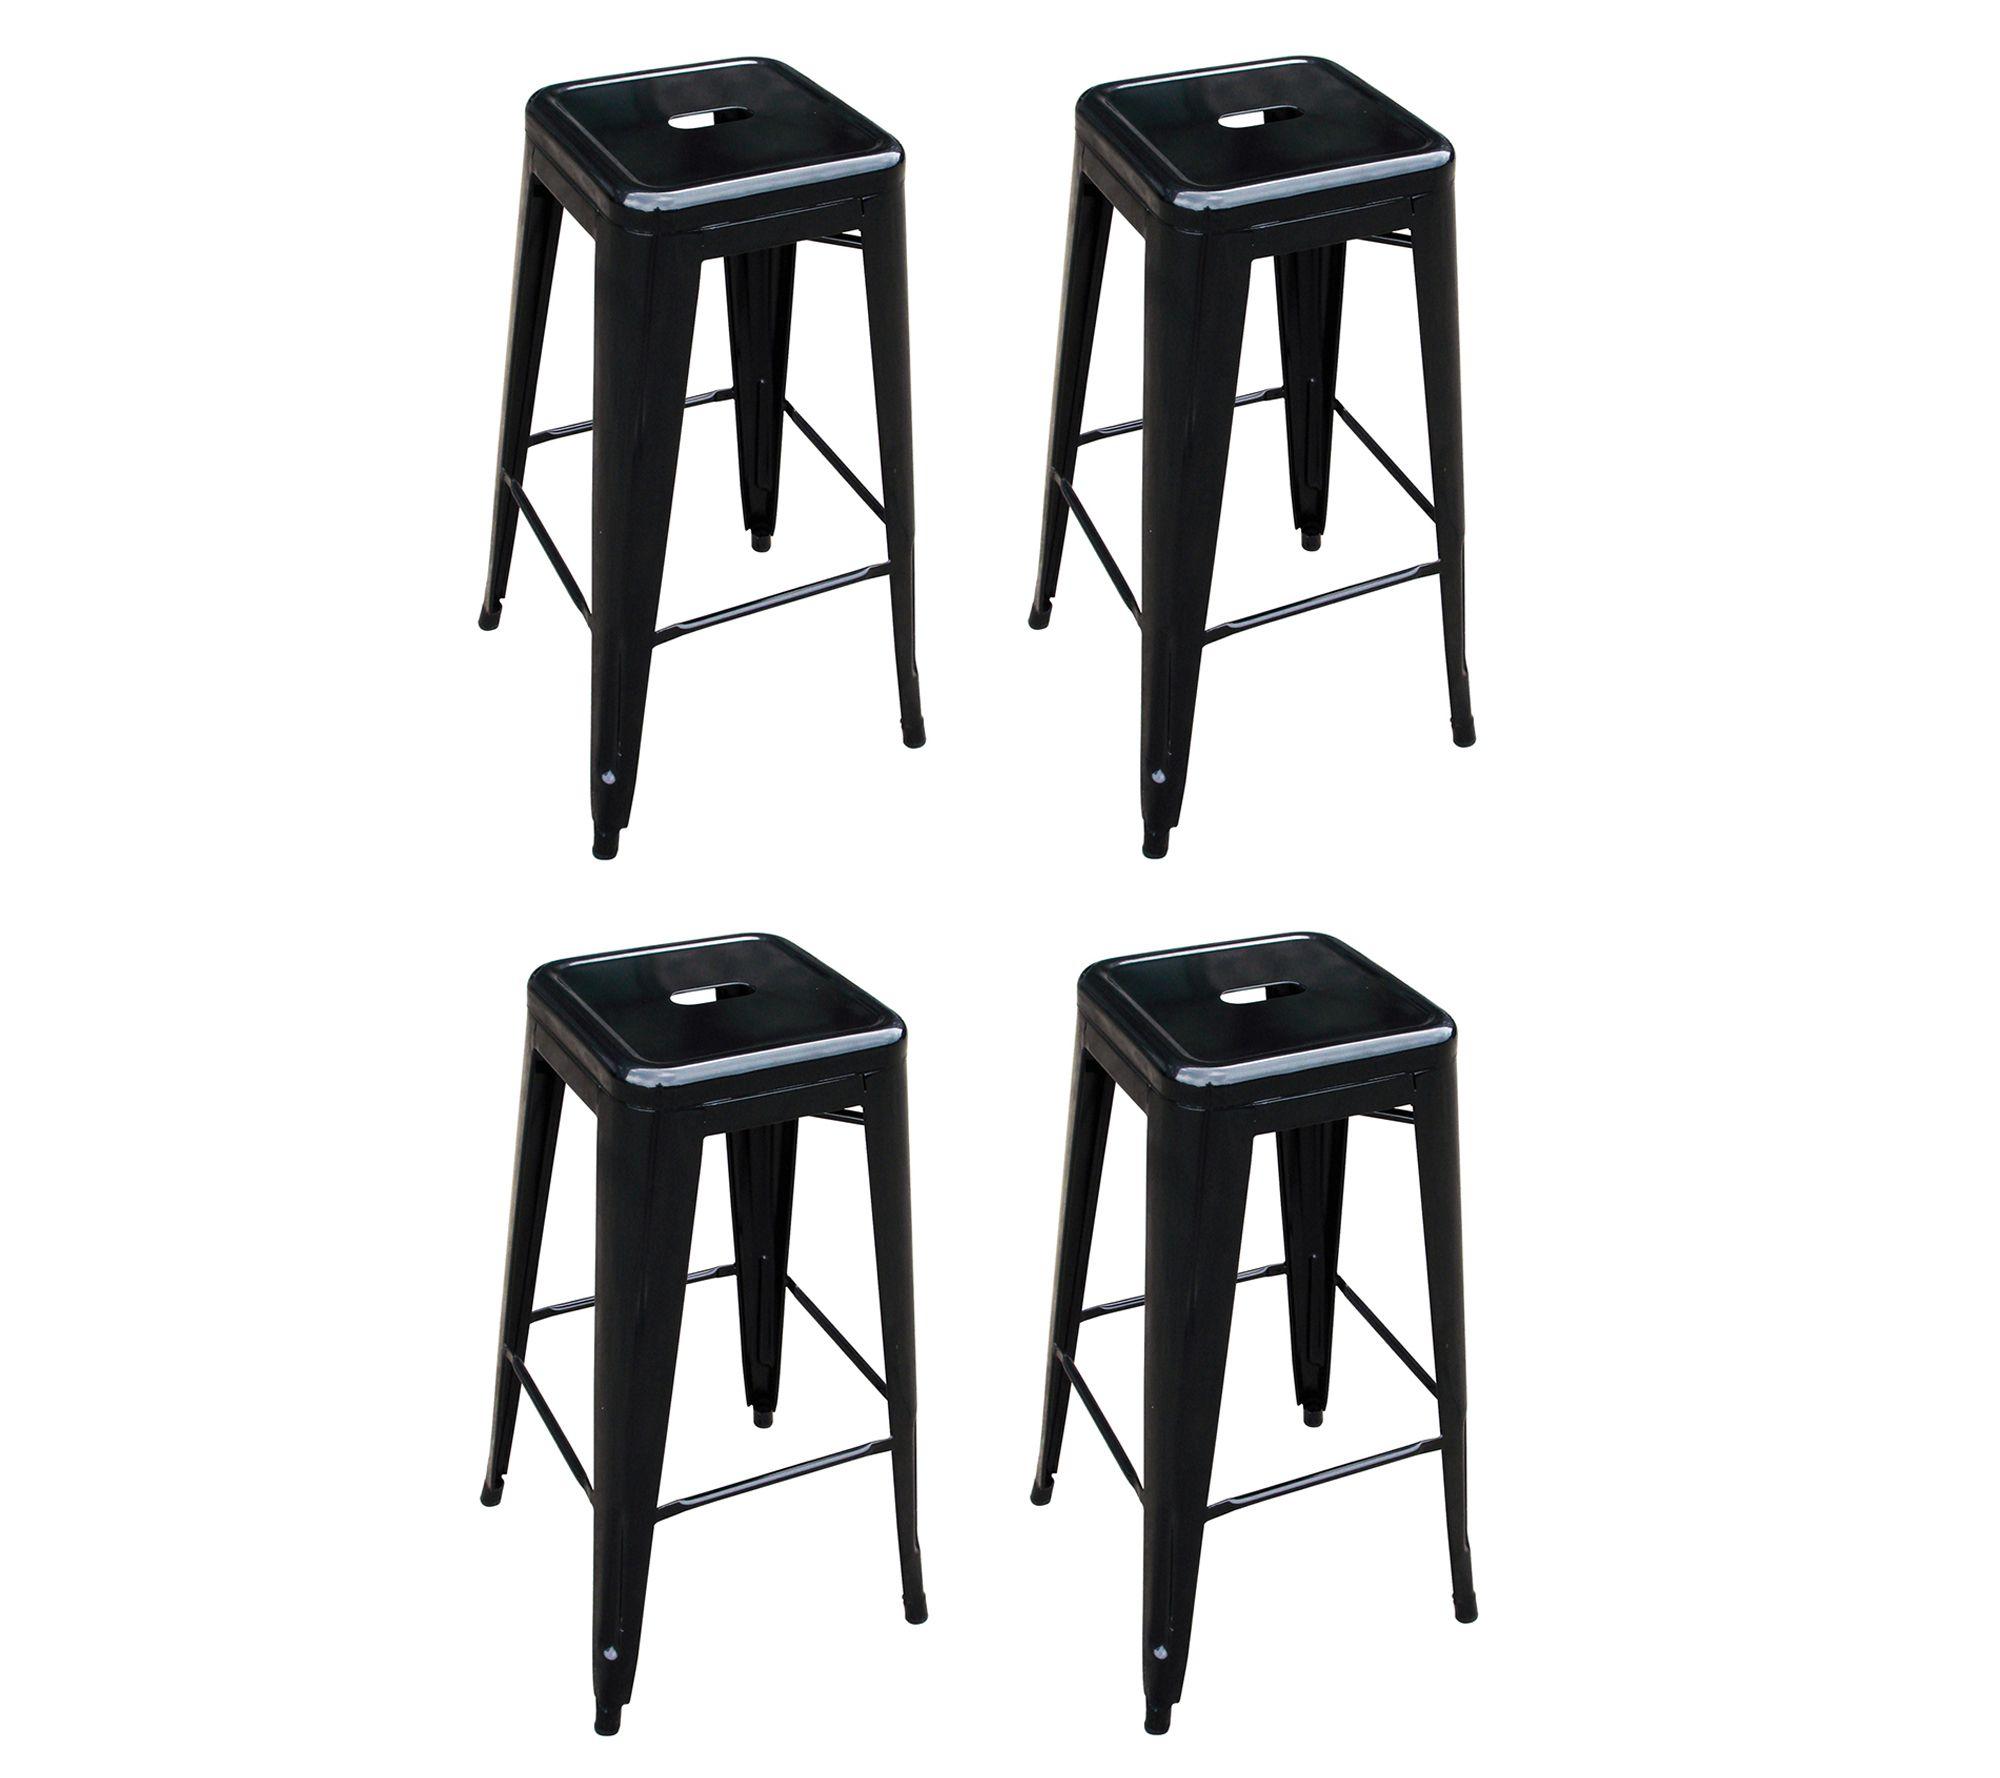 Astonishing Amerihome 30H Metal Bar Stool 4 Pack Qvc Com Gamerscity Chair Design For Home Gamerscityorg